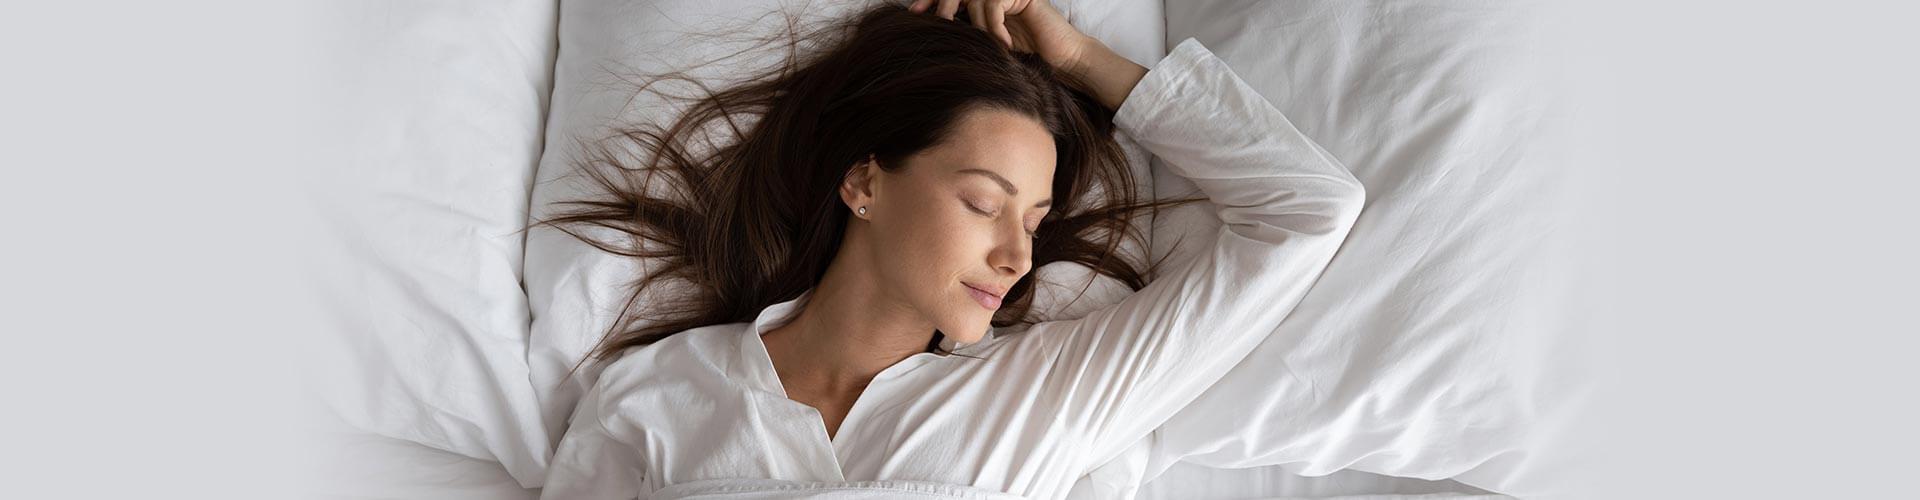 Sleeping woman on white sheets